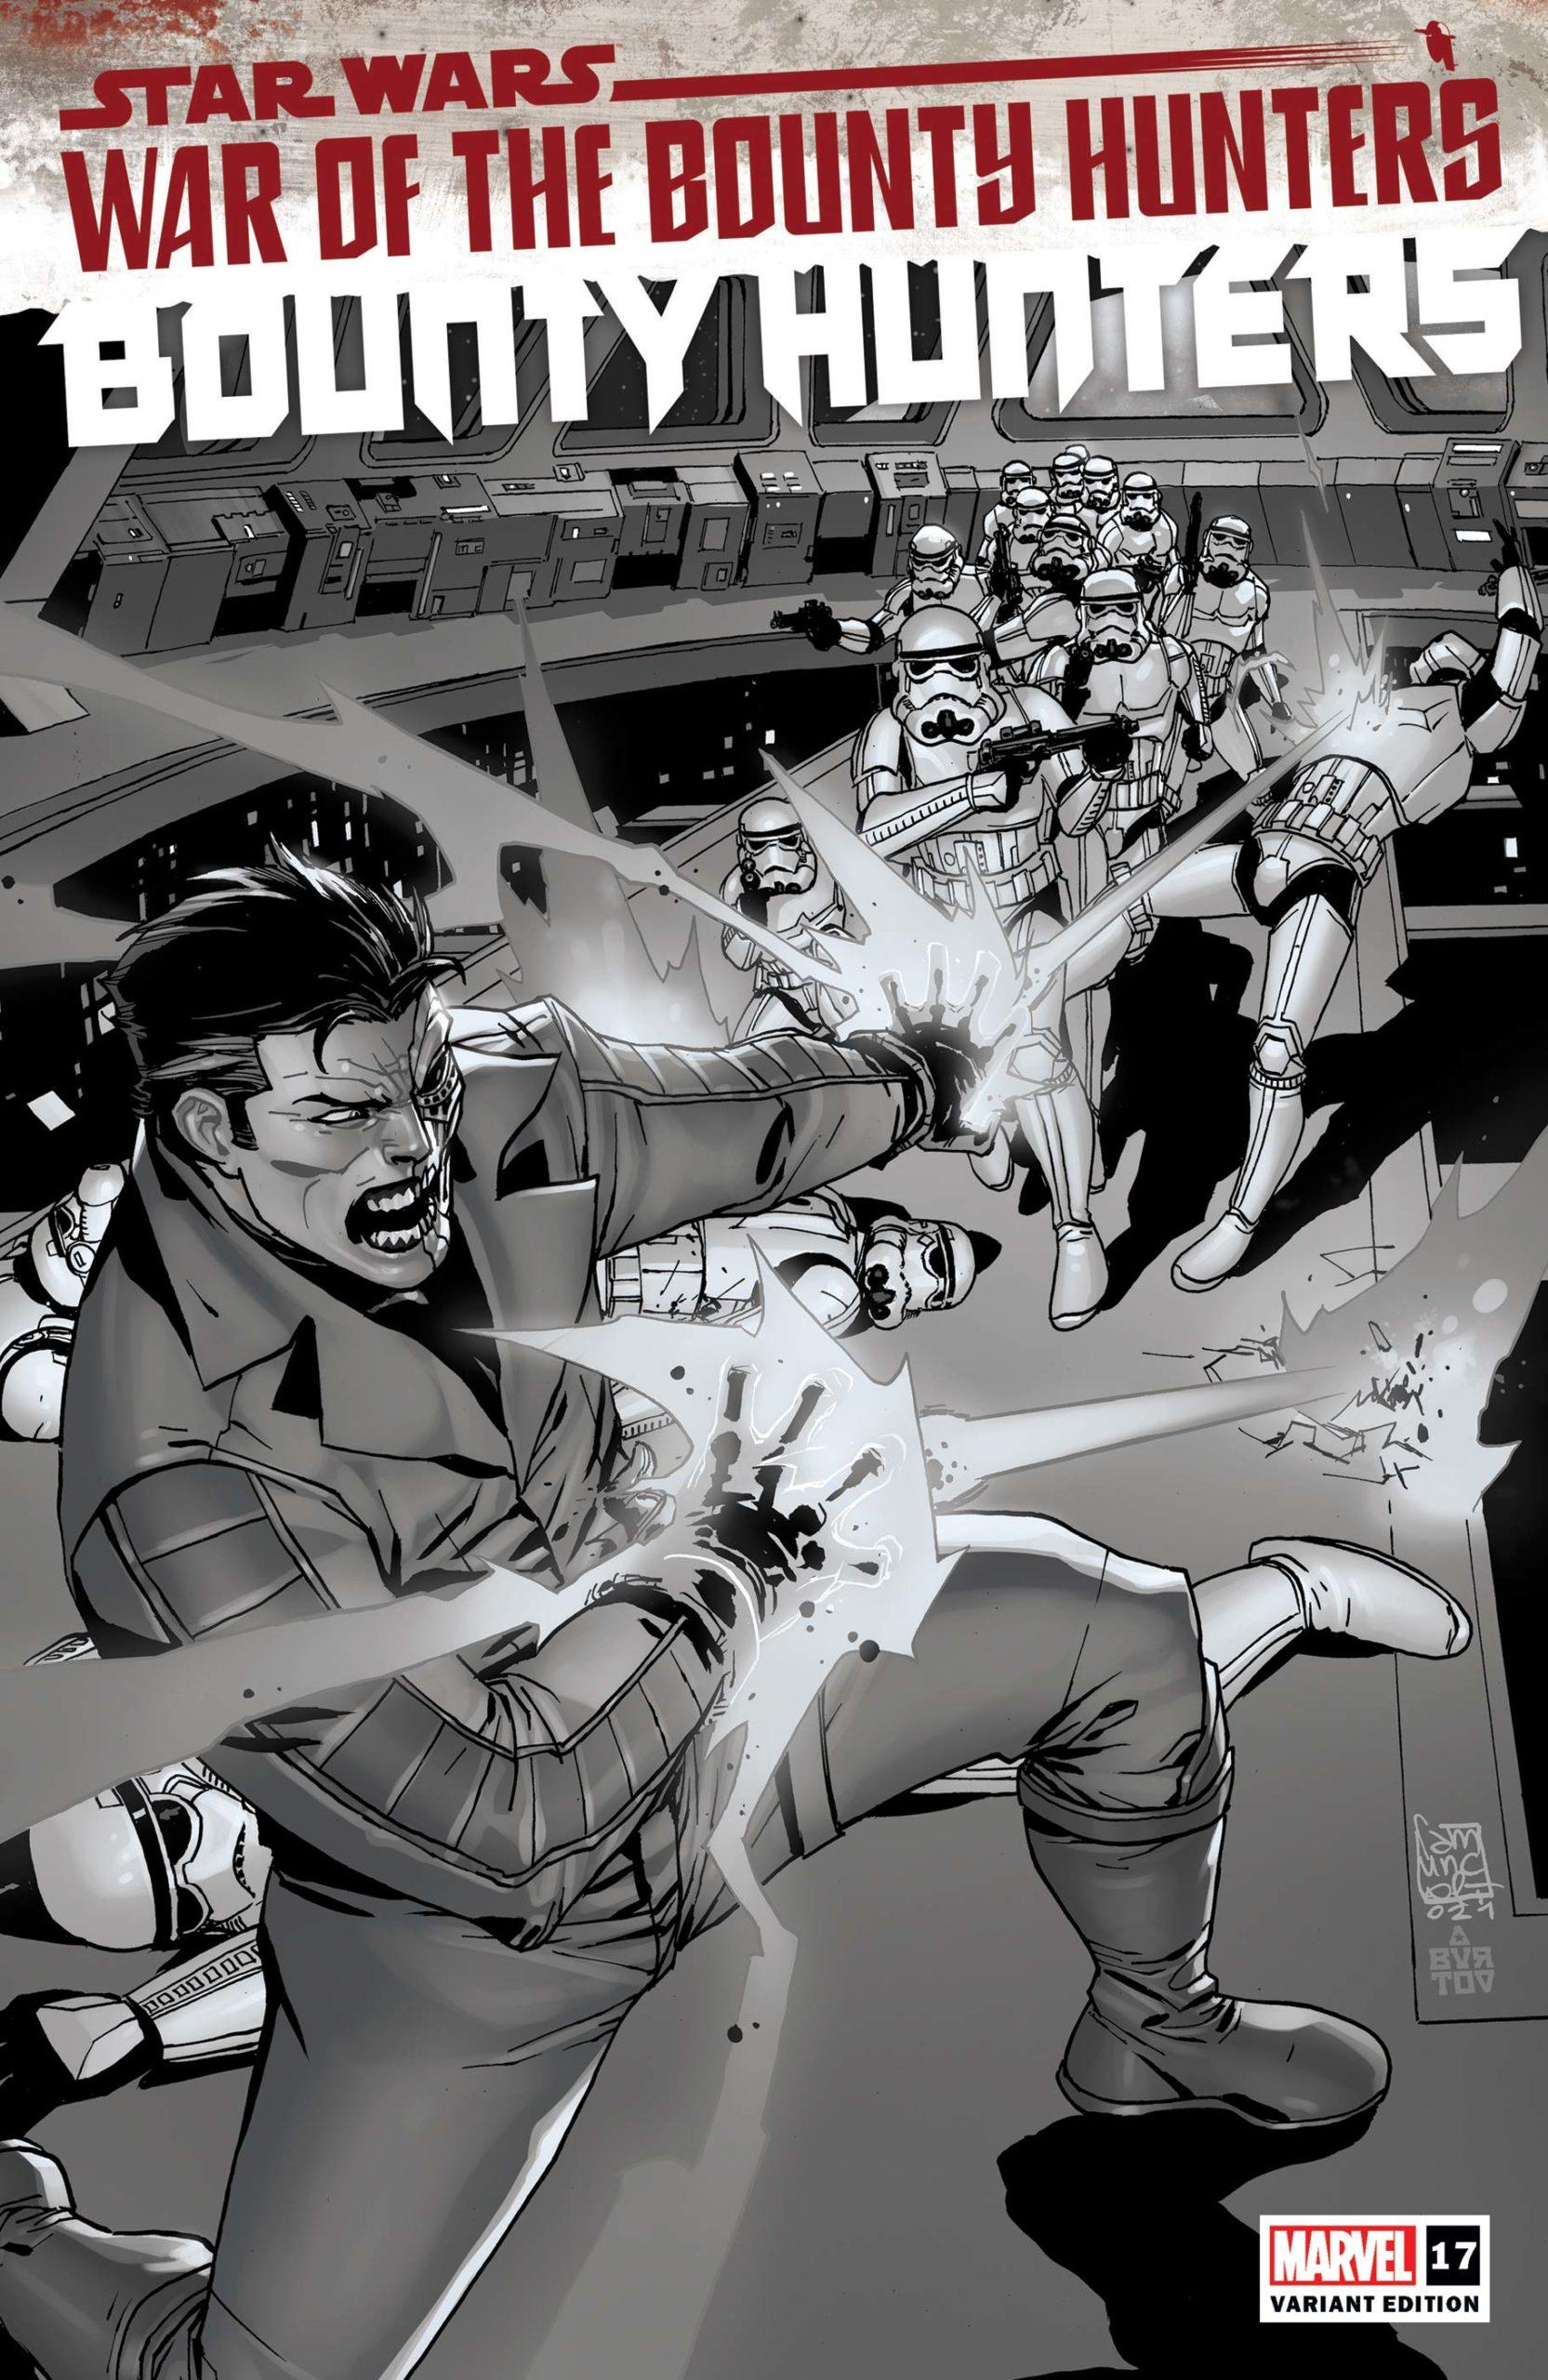 Bounty Hunters #17 (Giuseppe Camuncoli Carbonite Variant Cover) (27.10.2021)